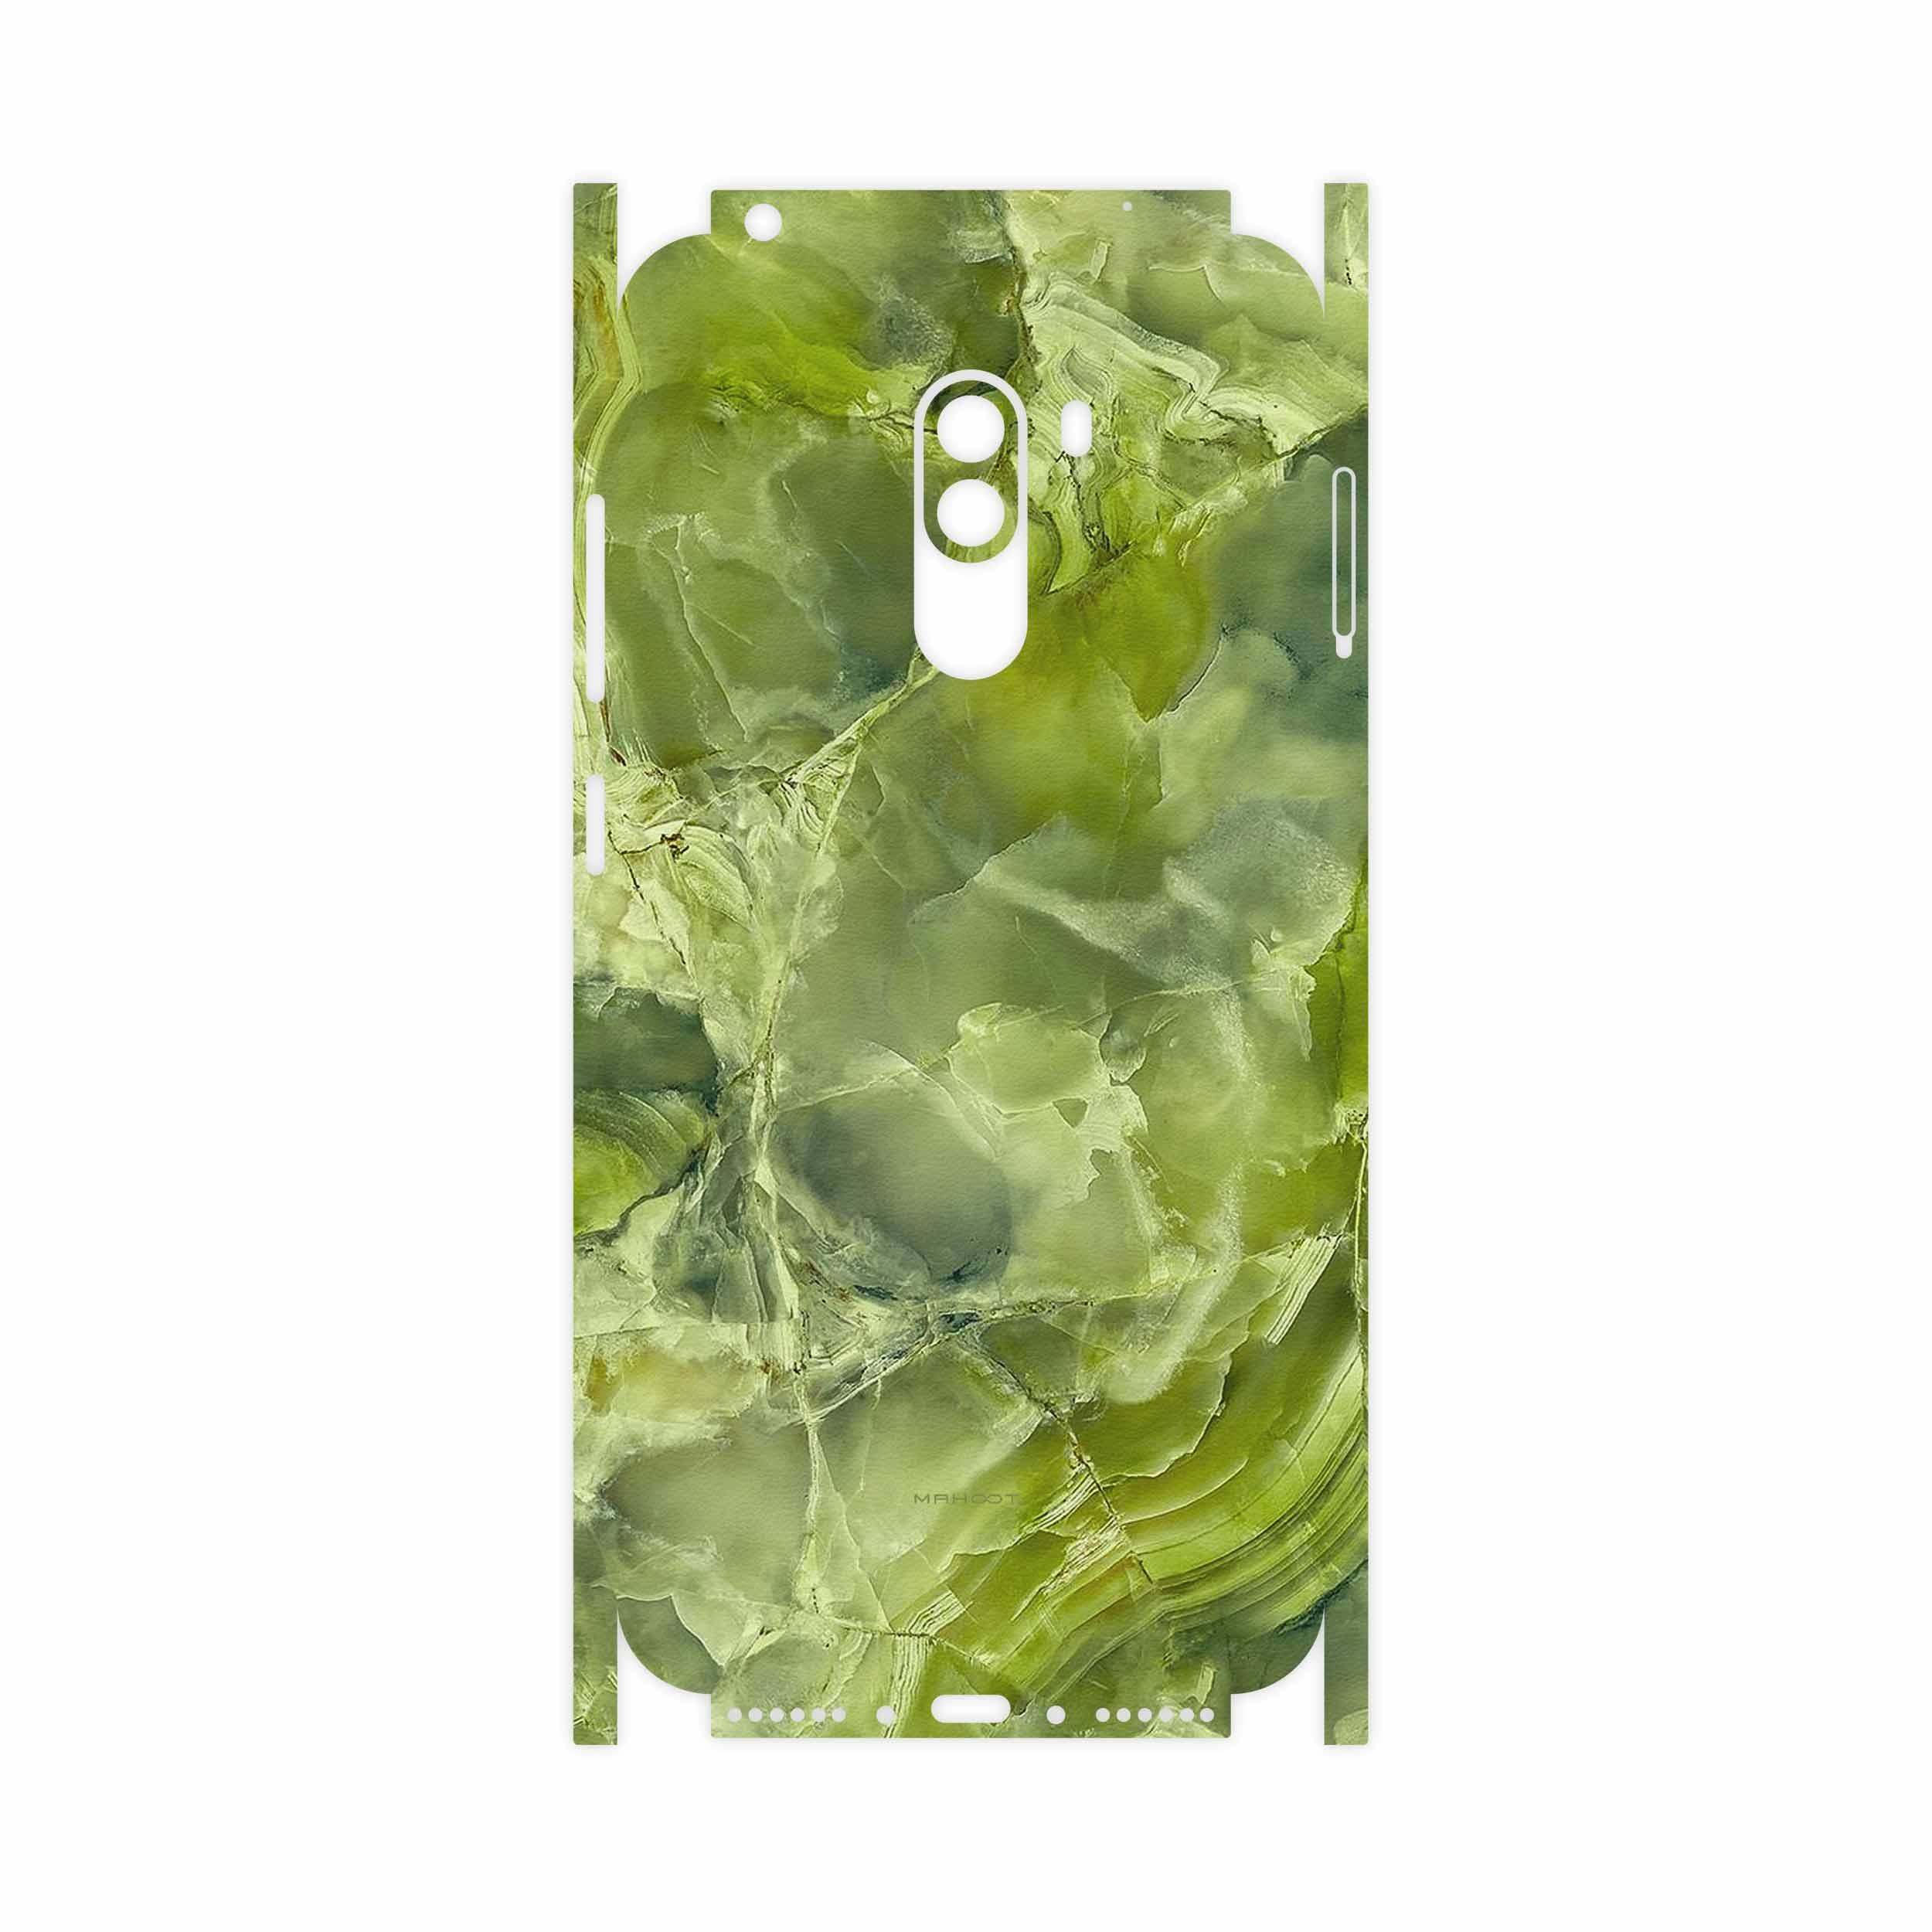 برچسب پوششی ماهوت مدل Green Crystal Marble-FullSkin مناسب برای گوشی موبایل شیائومی POCOPHONE F1